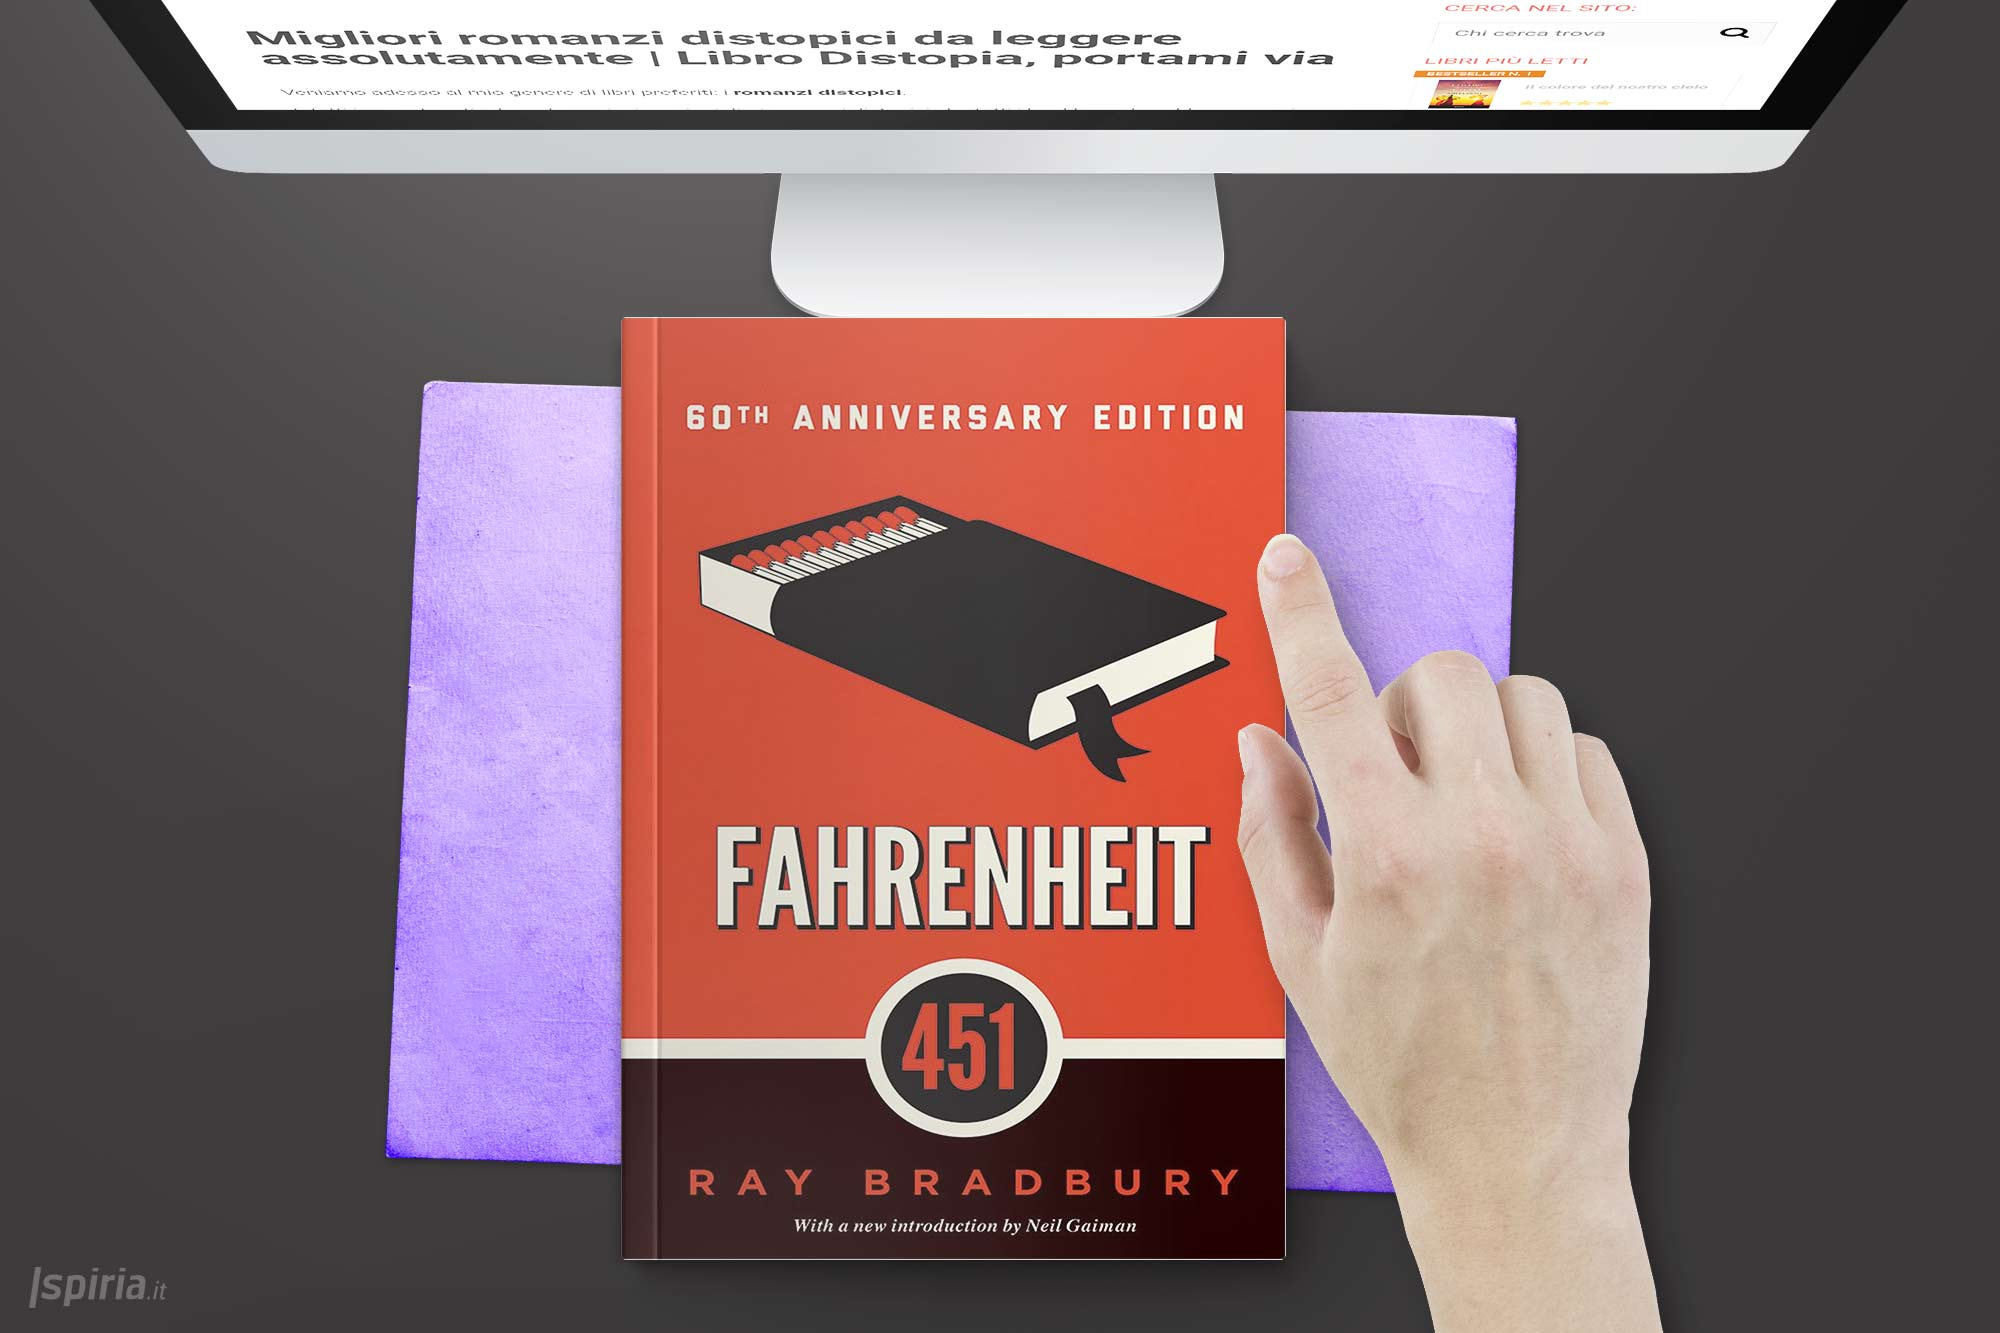 fahrenheit-451-ray-bradbury-libro-distopico